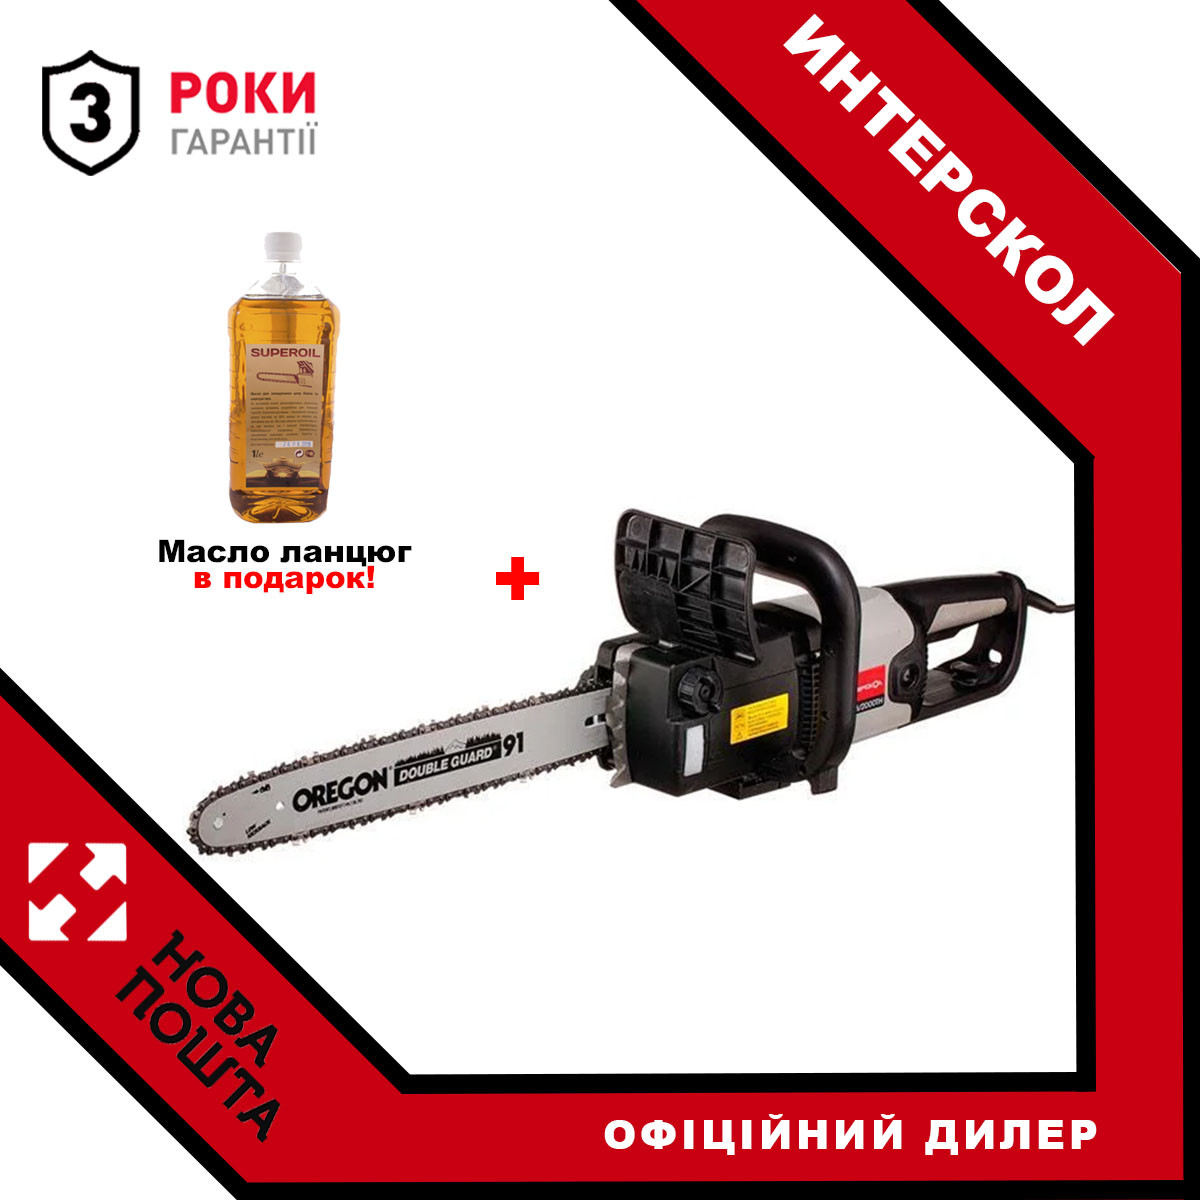 Пила ланцюгова Интерскол ПЦ-16/2000Т + В подарунок масло ланцюг!